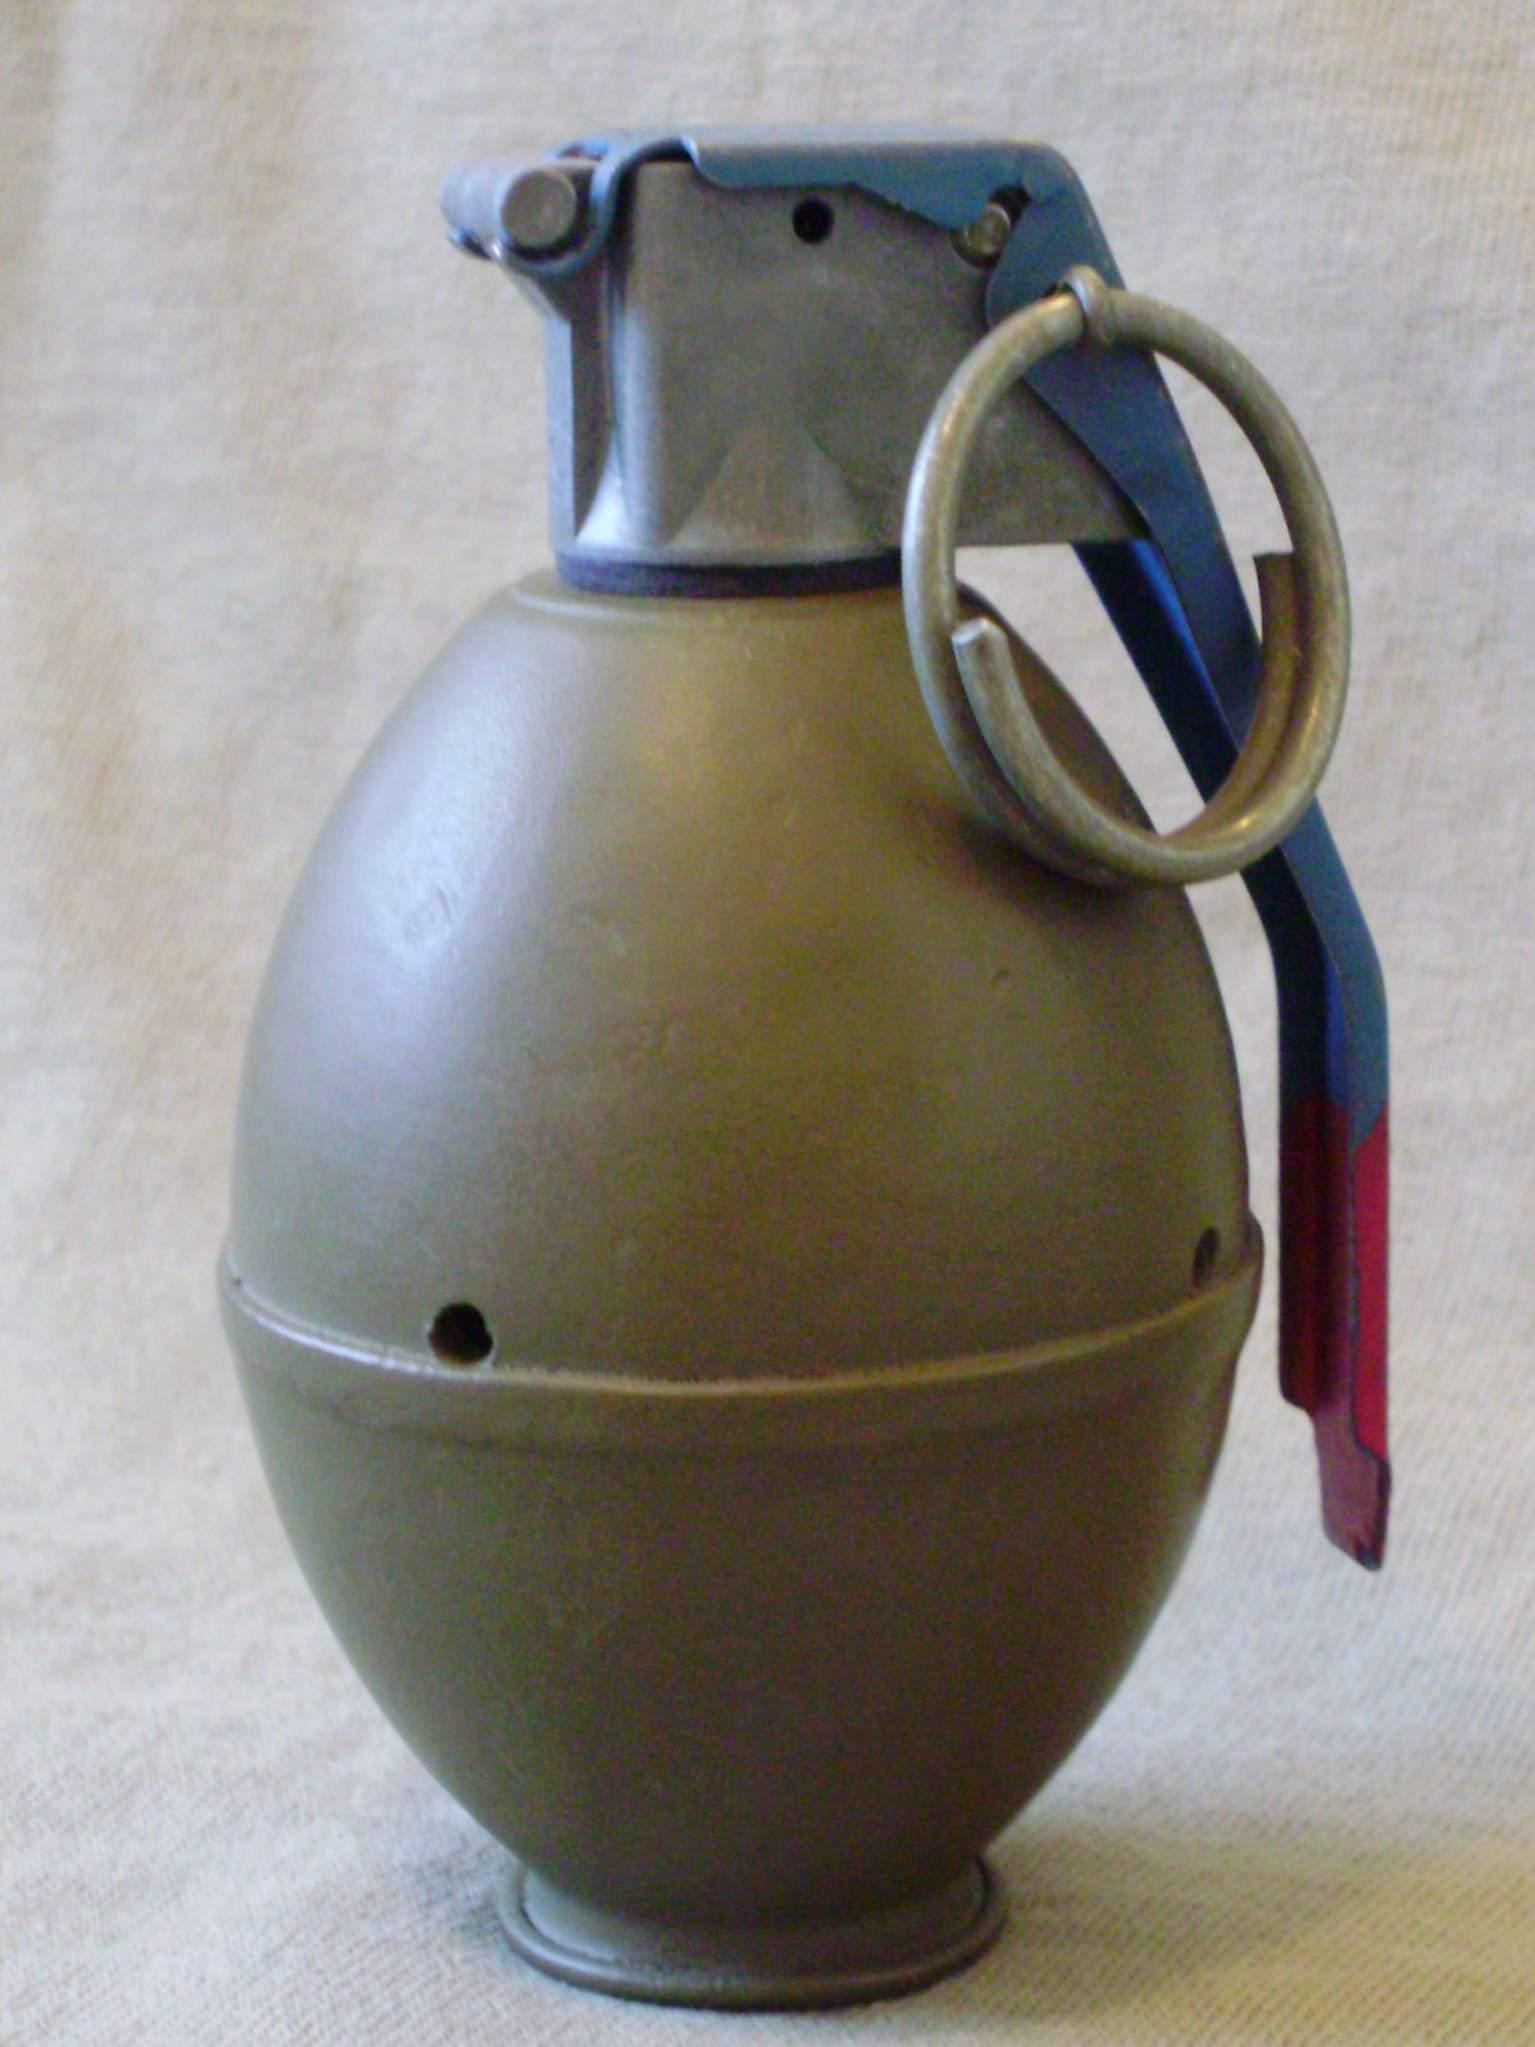 m61 grenade - photo #39